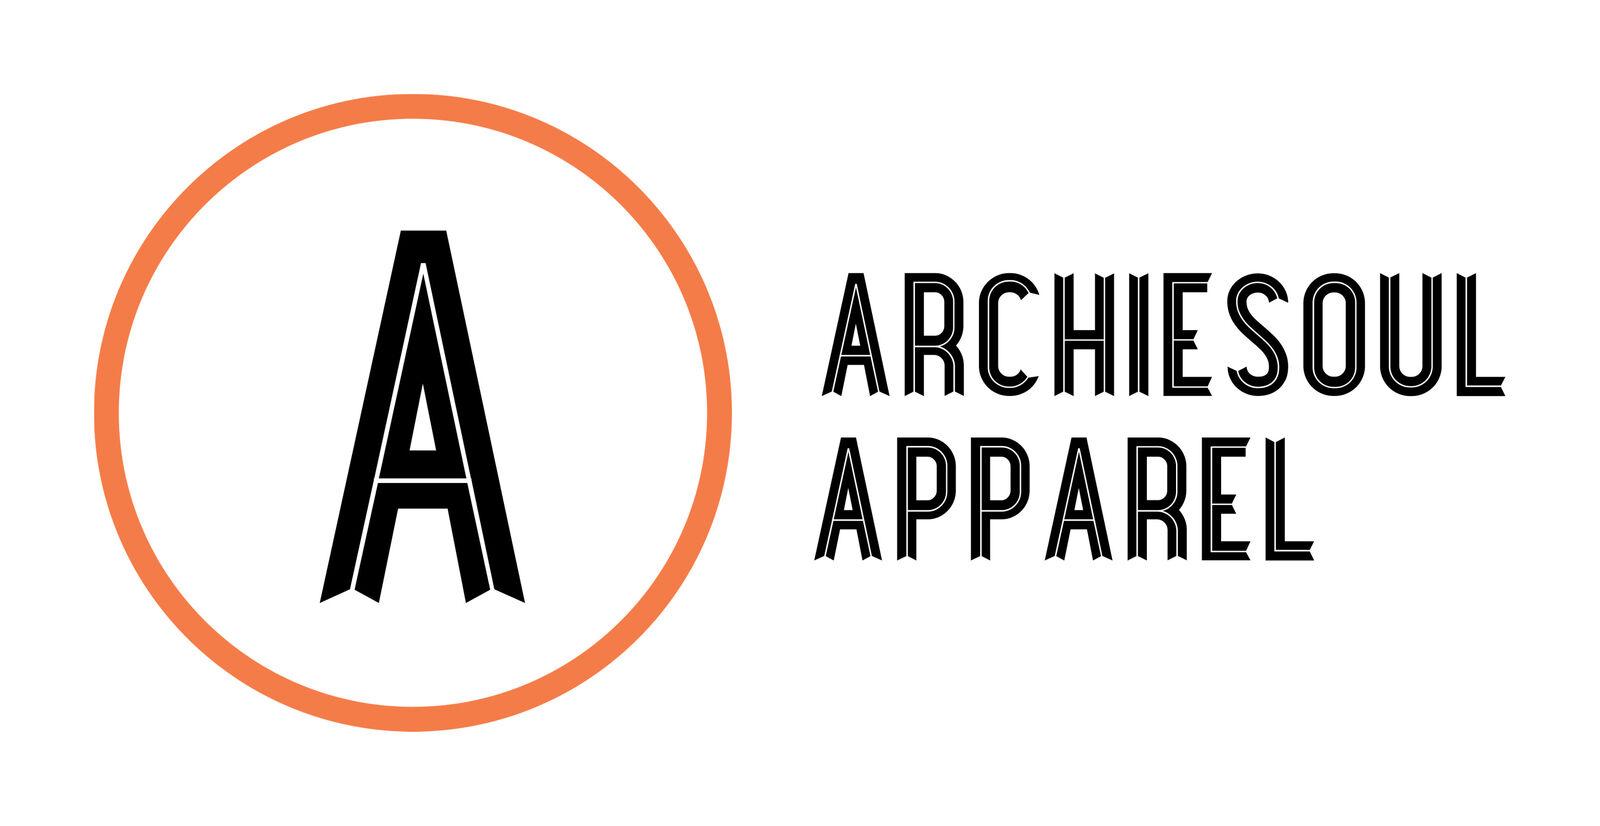 ArchieSoul Apparel